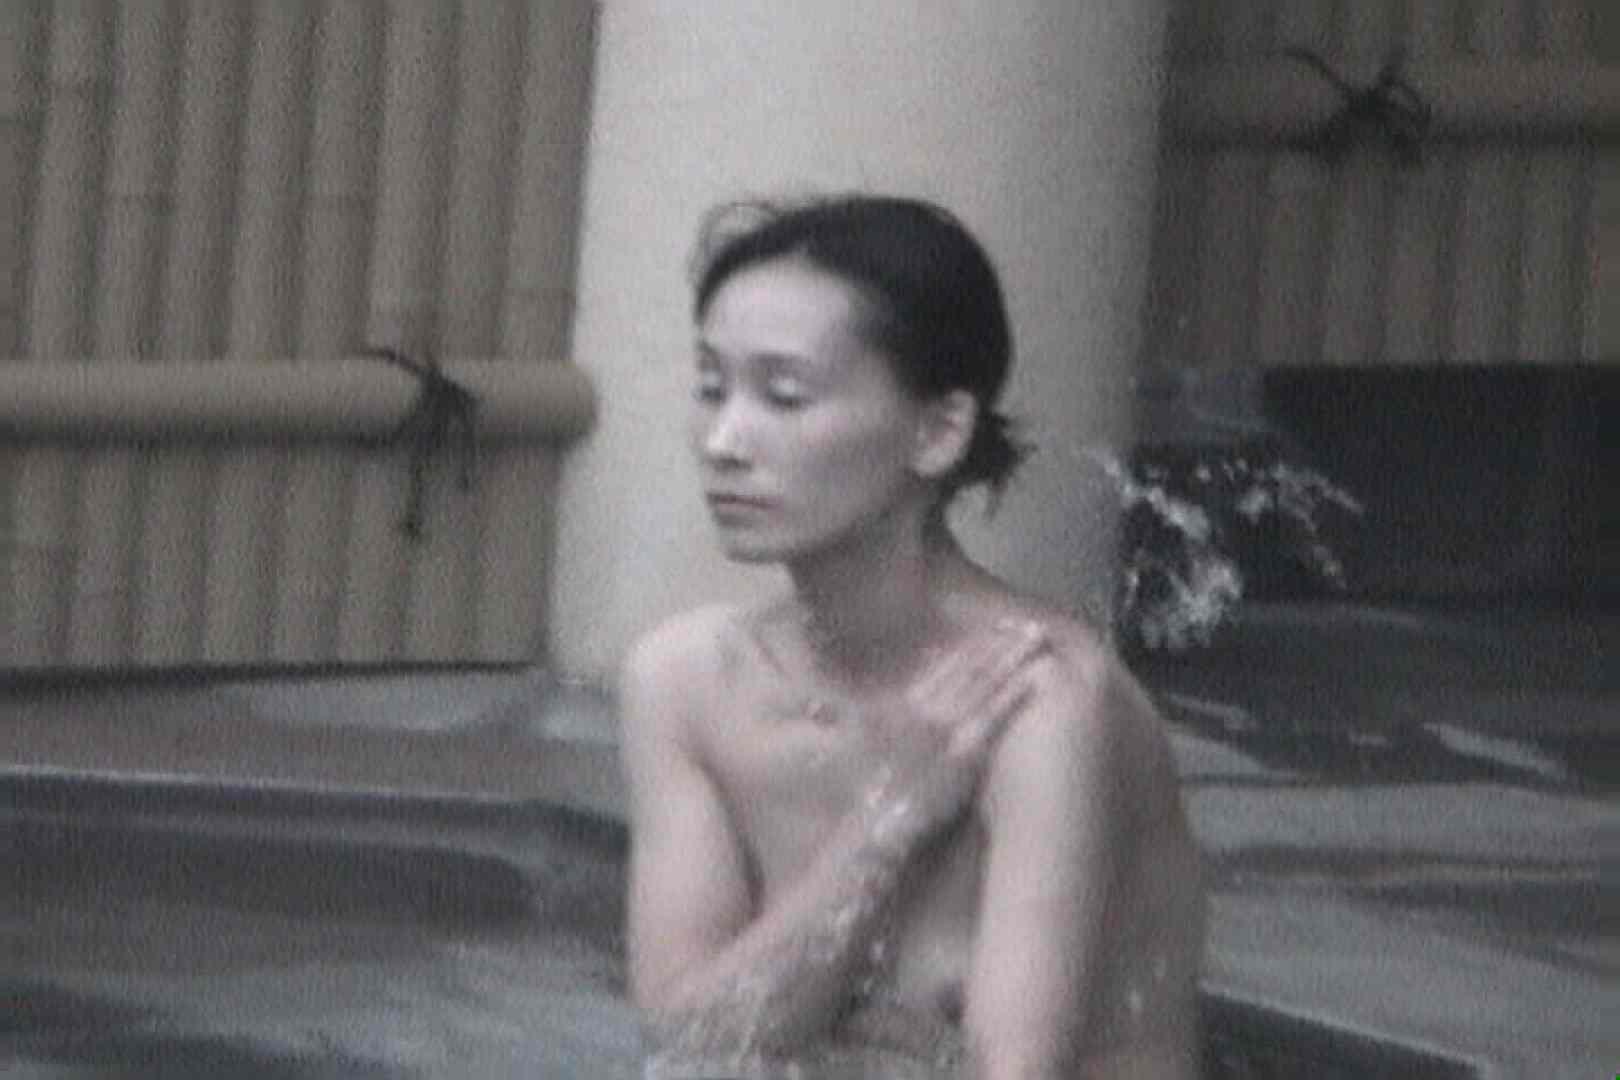 Aquaな露天風呂Vol.557 露天風呂編  100PIX 92